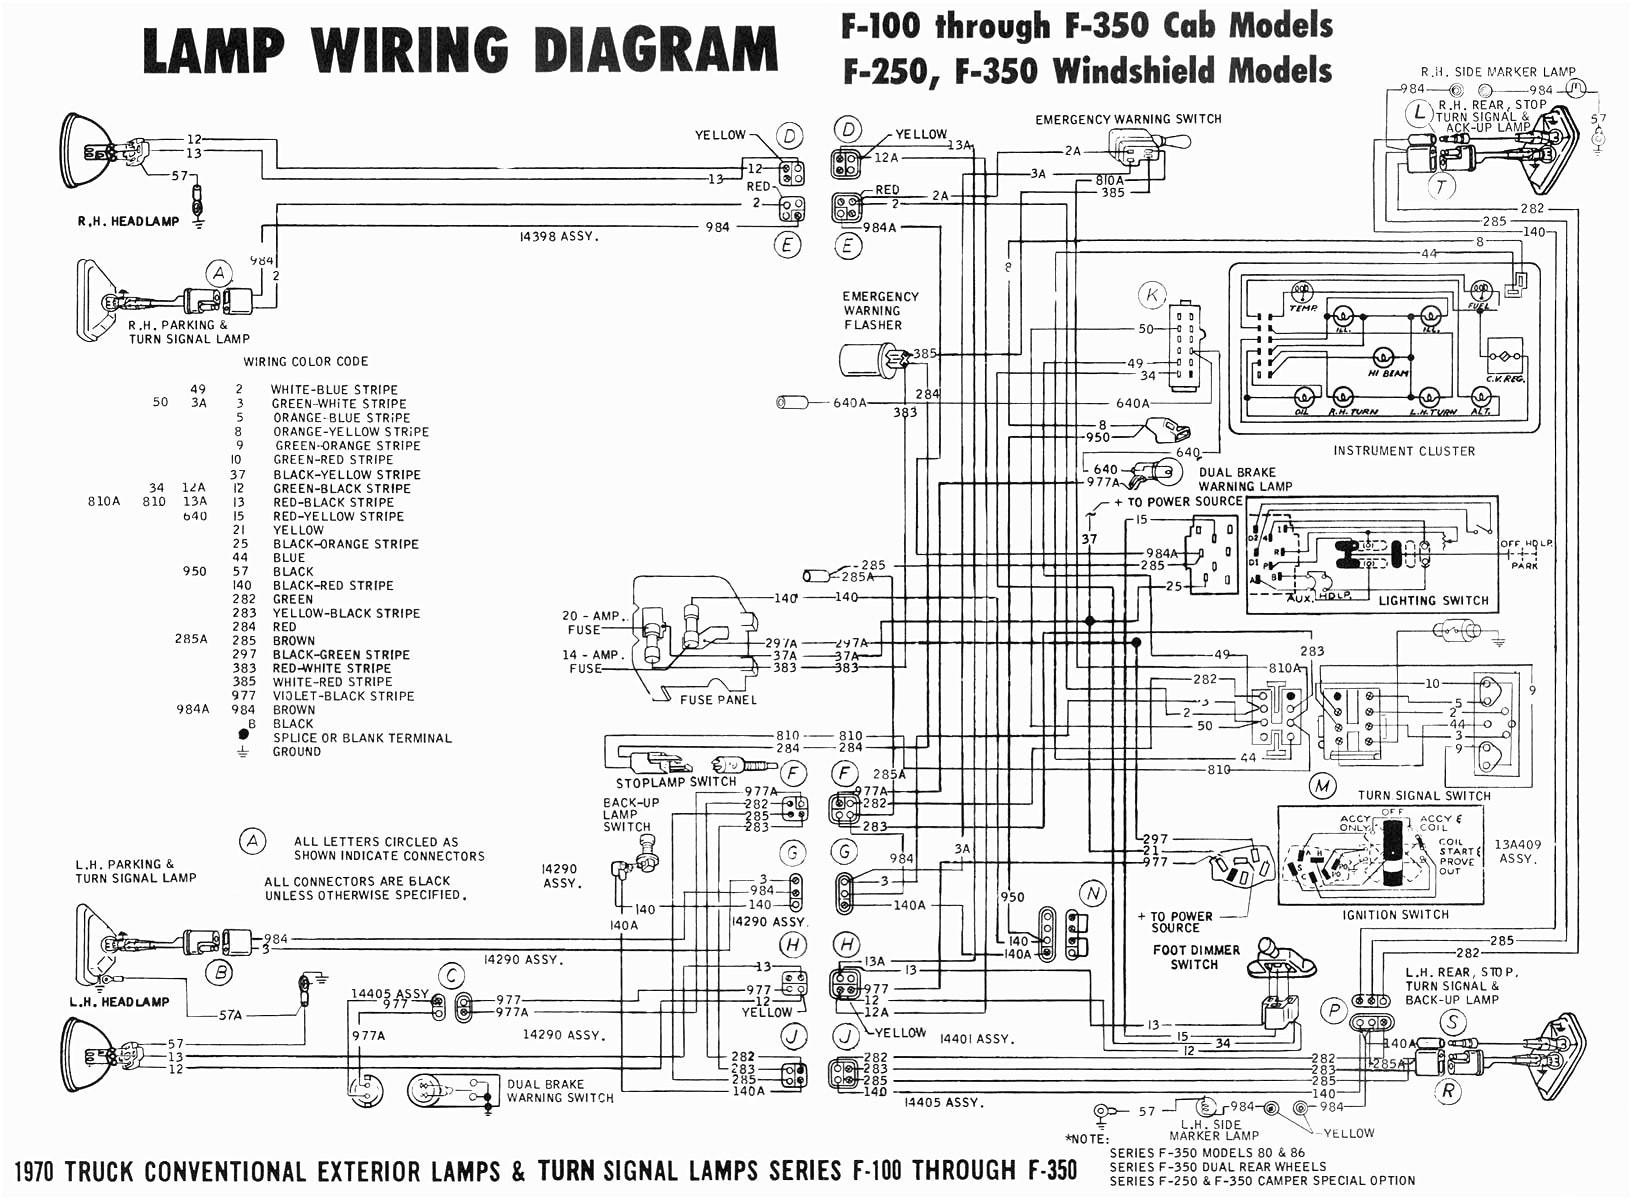 wiring diagram gl1100 auto meter wiring diagram secrets wiring diagram gl1100 auto meter